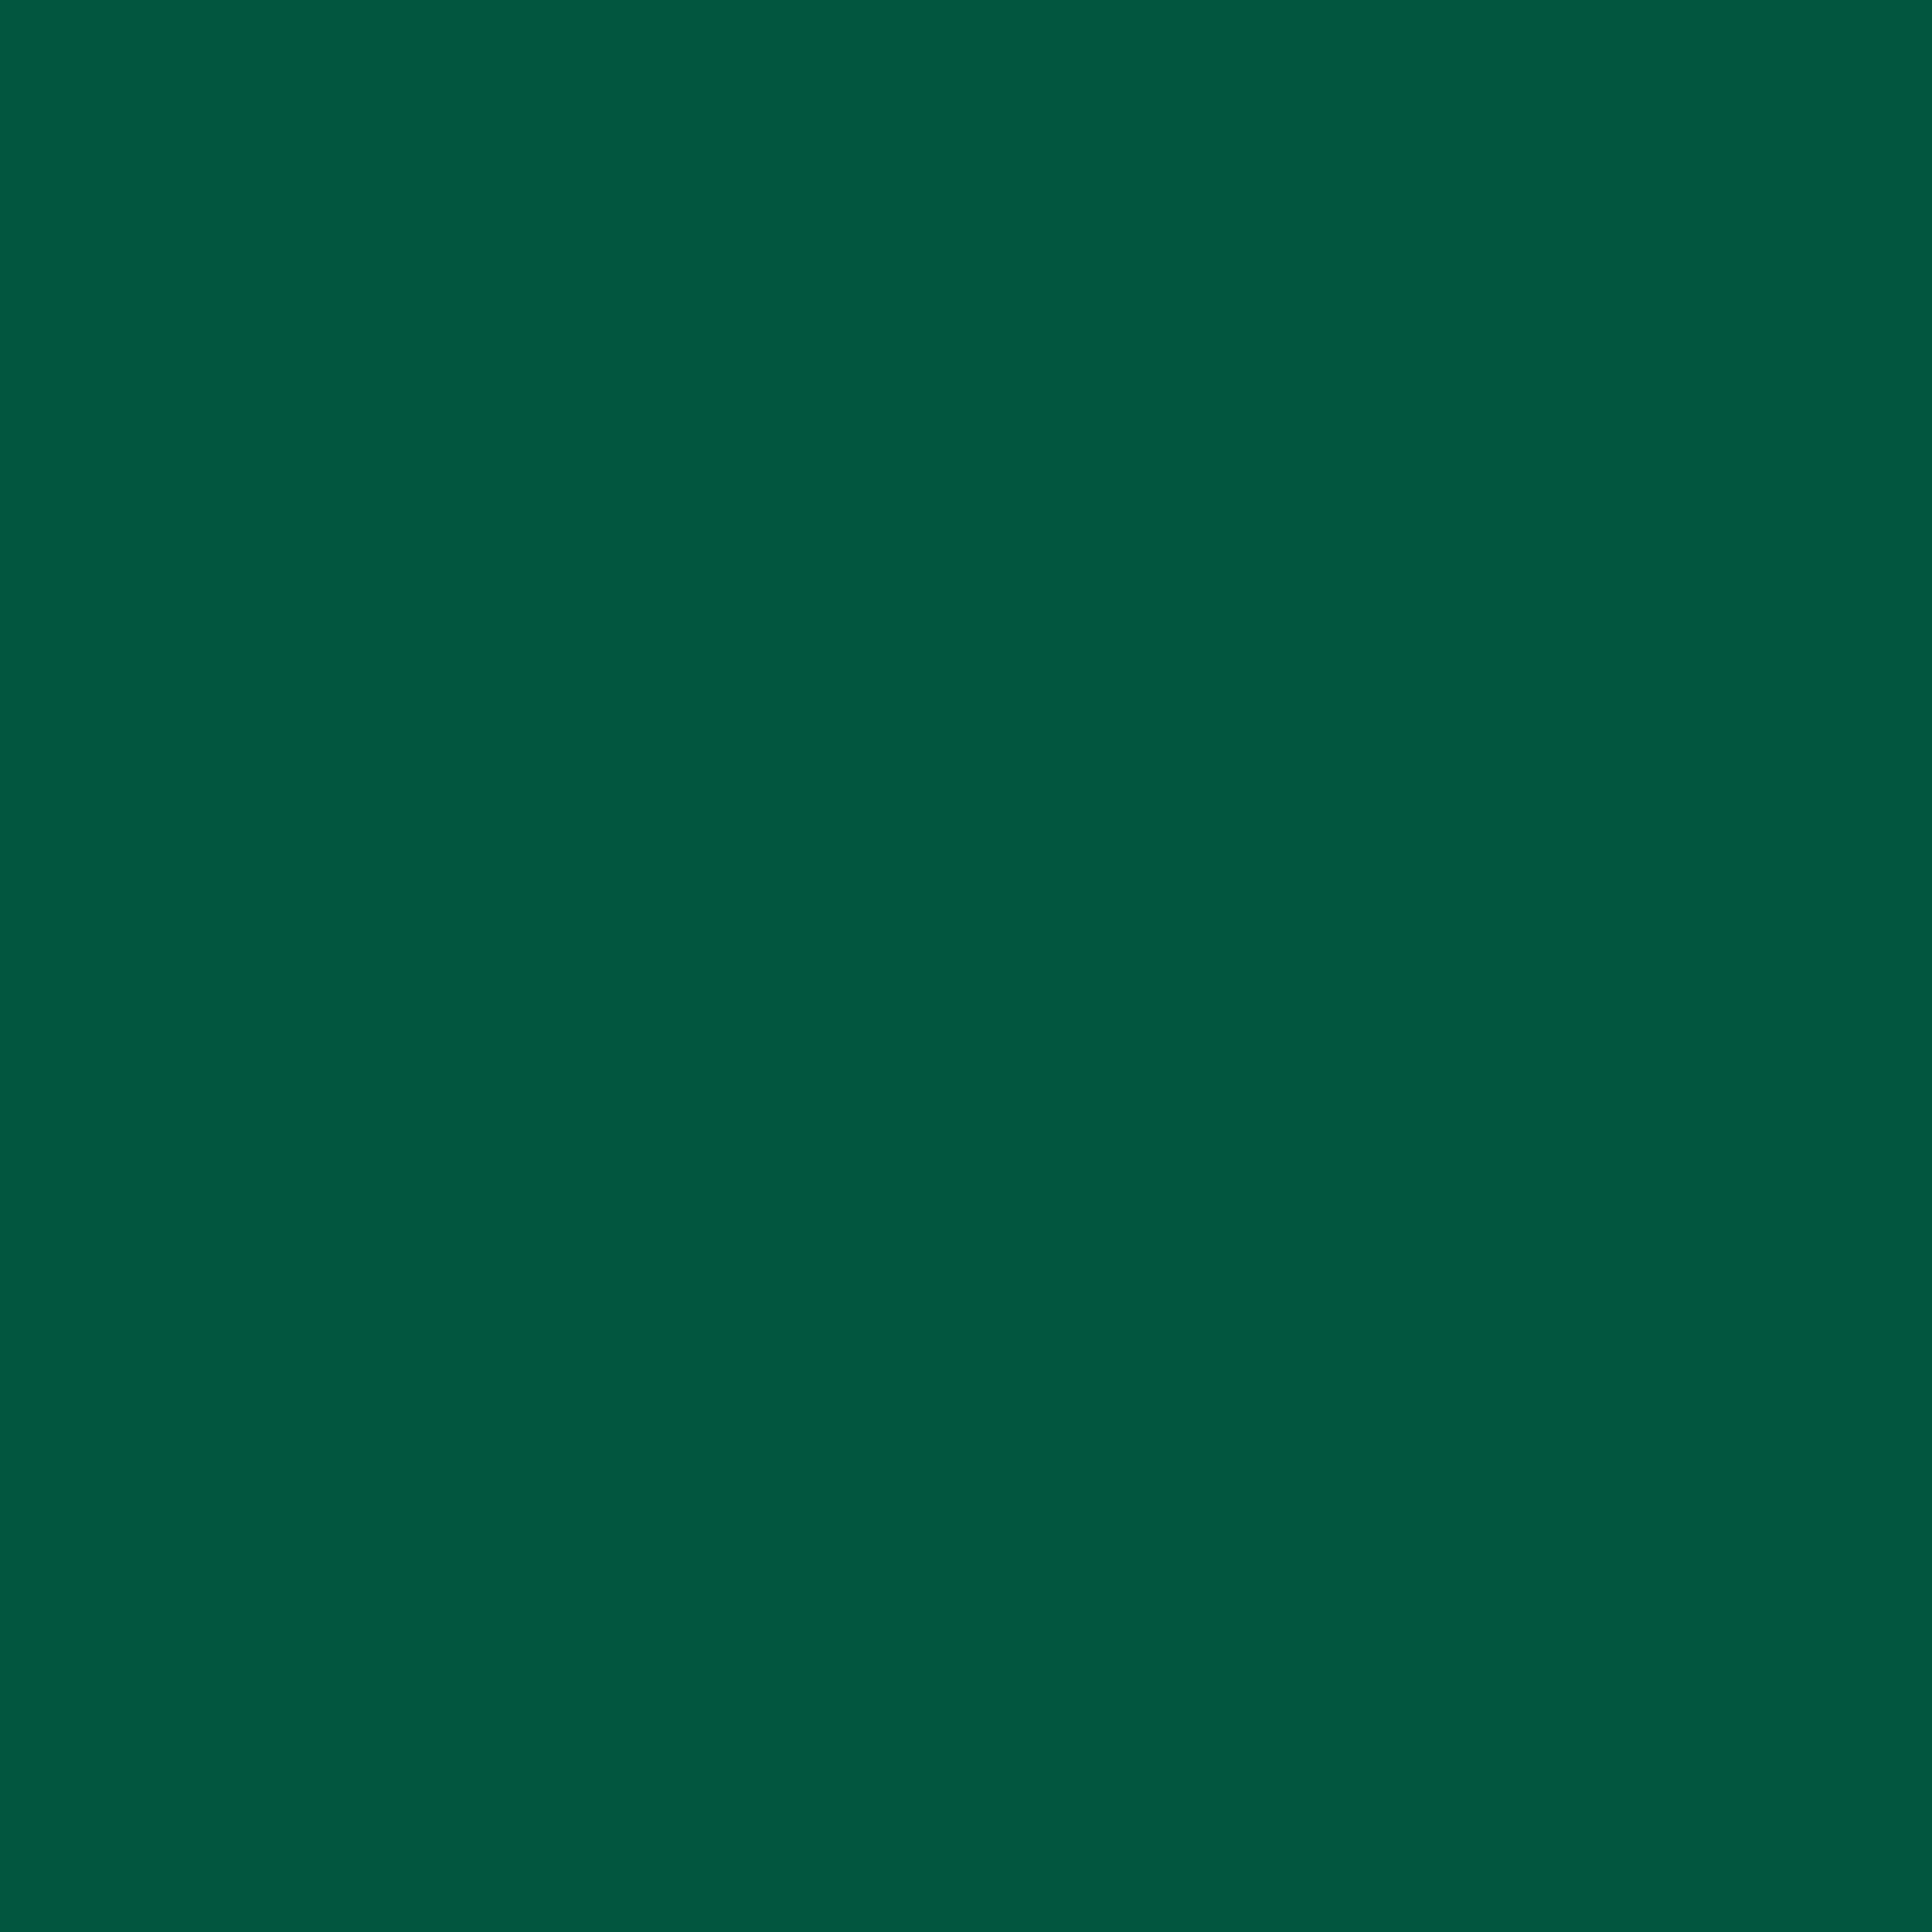 3600x3600 Castleton Green Solid Color Background